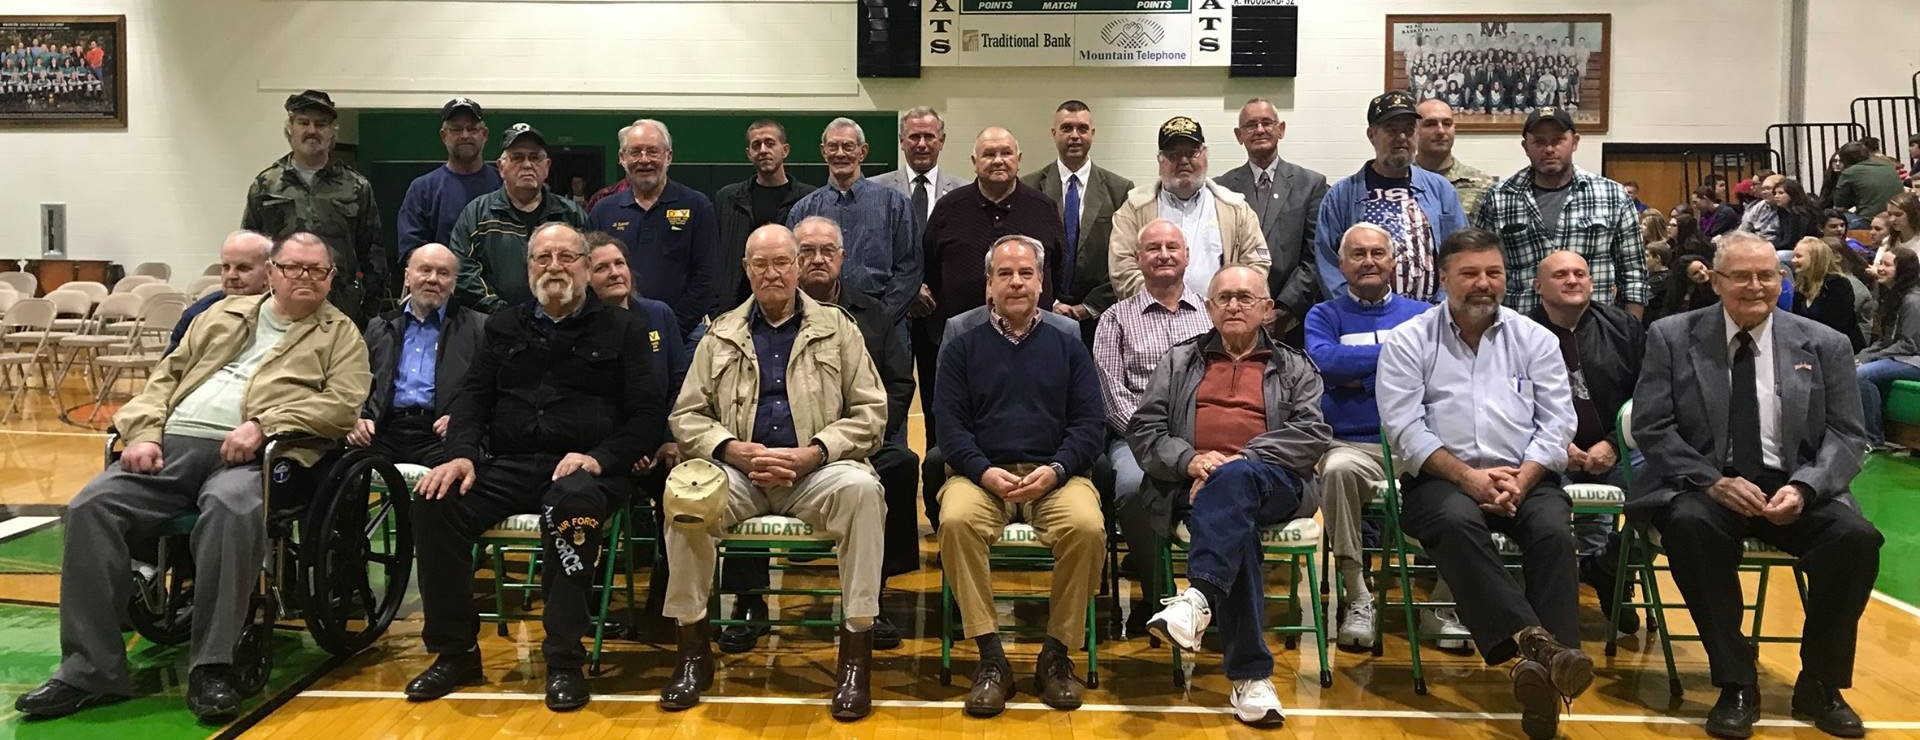 MCHS 2017 Veteran's Service